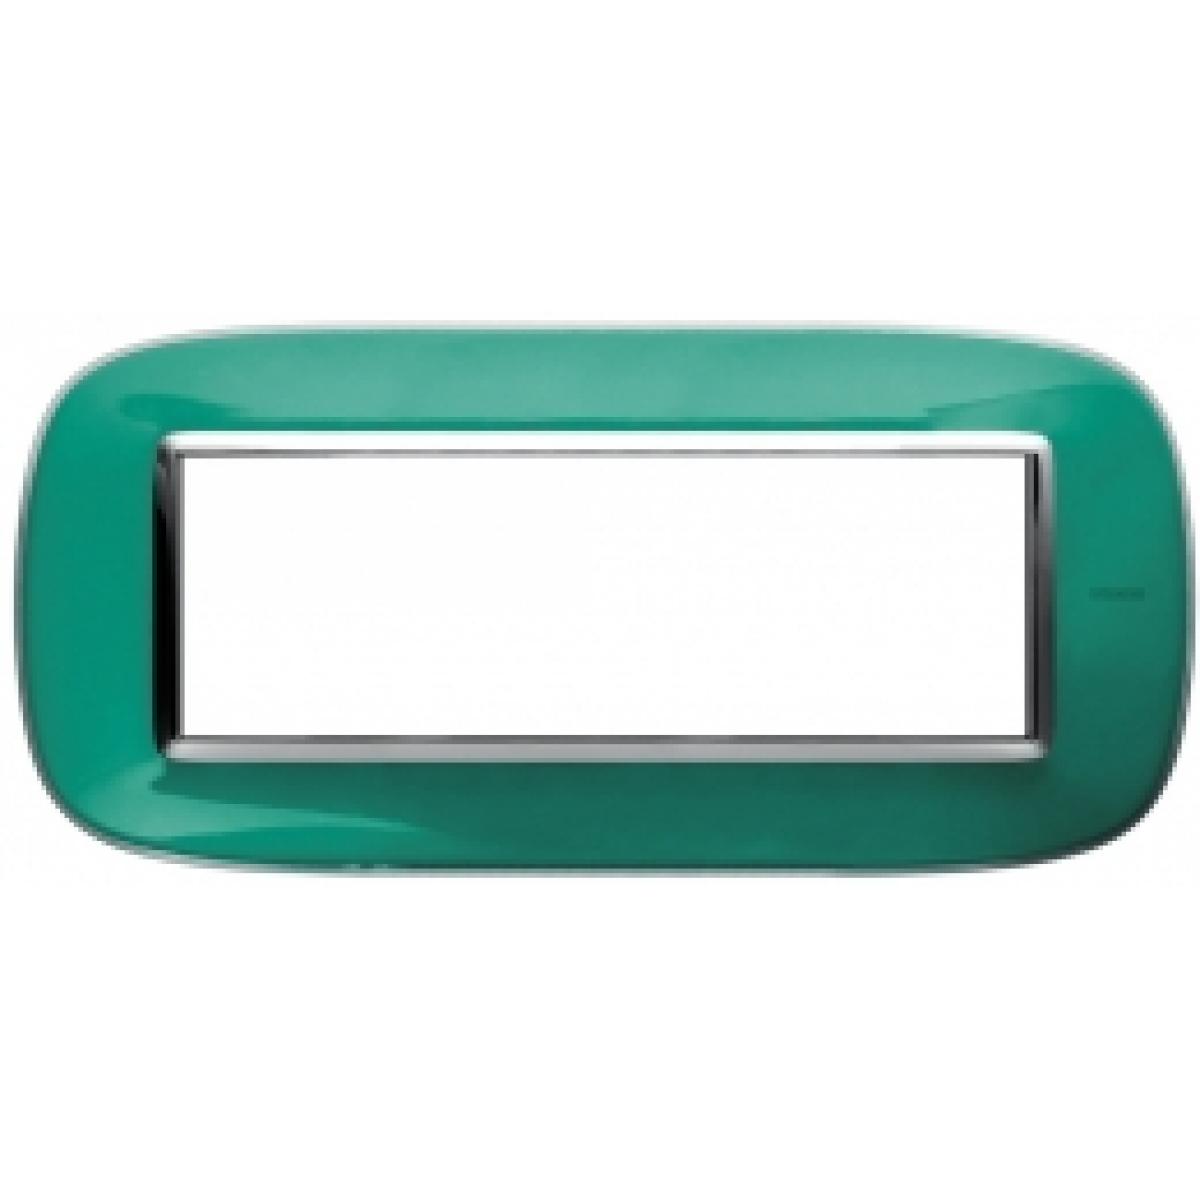 Placca Ovale 6 Posti Bticino Axolute Verde Liquido HB4806DV